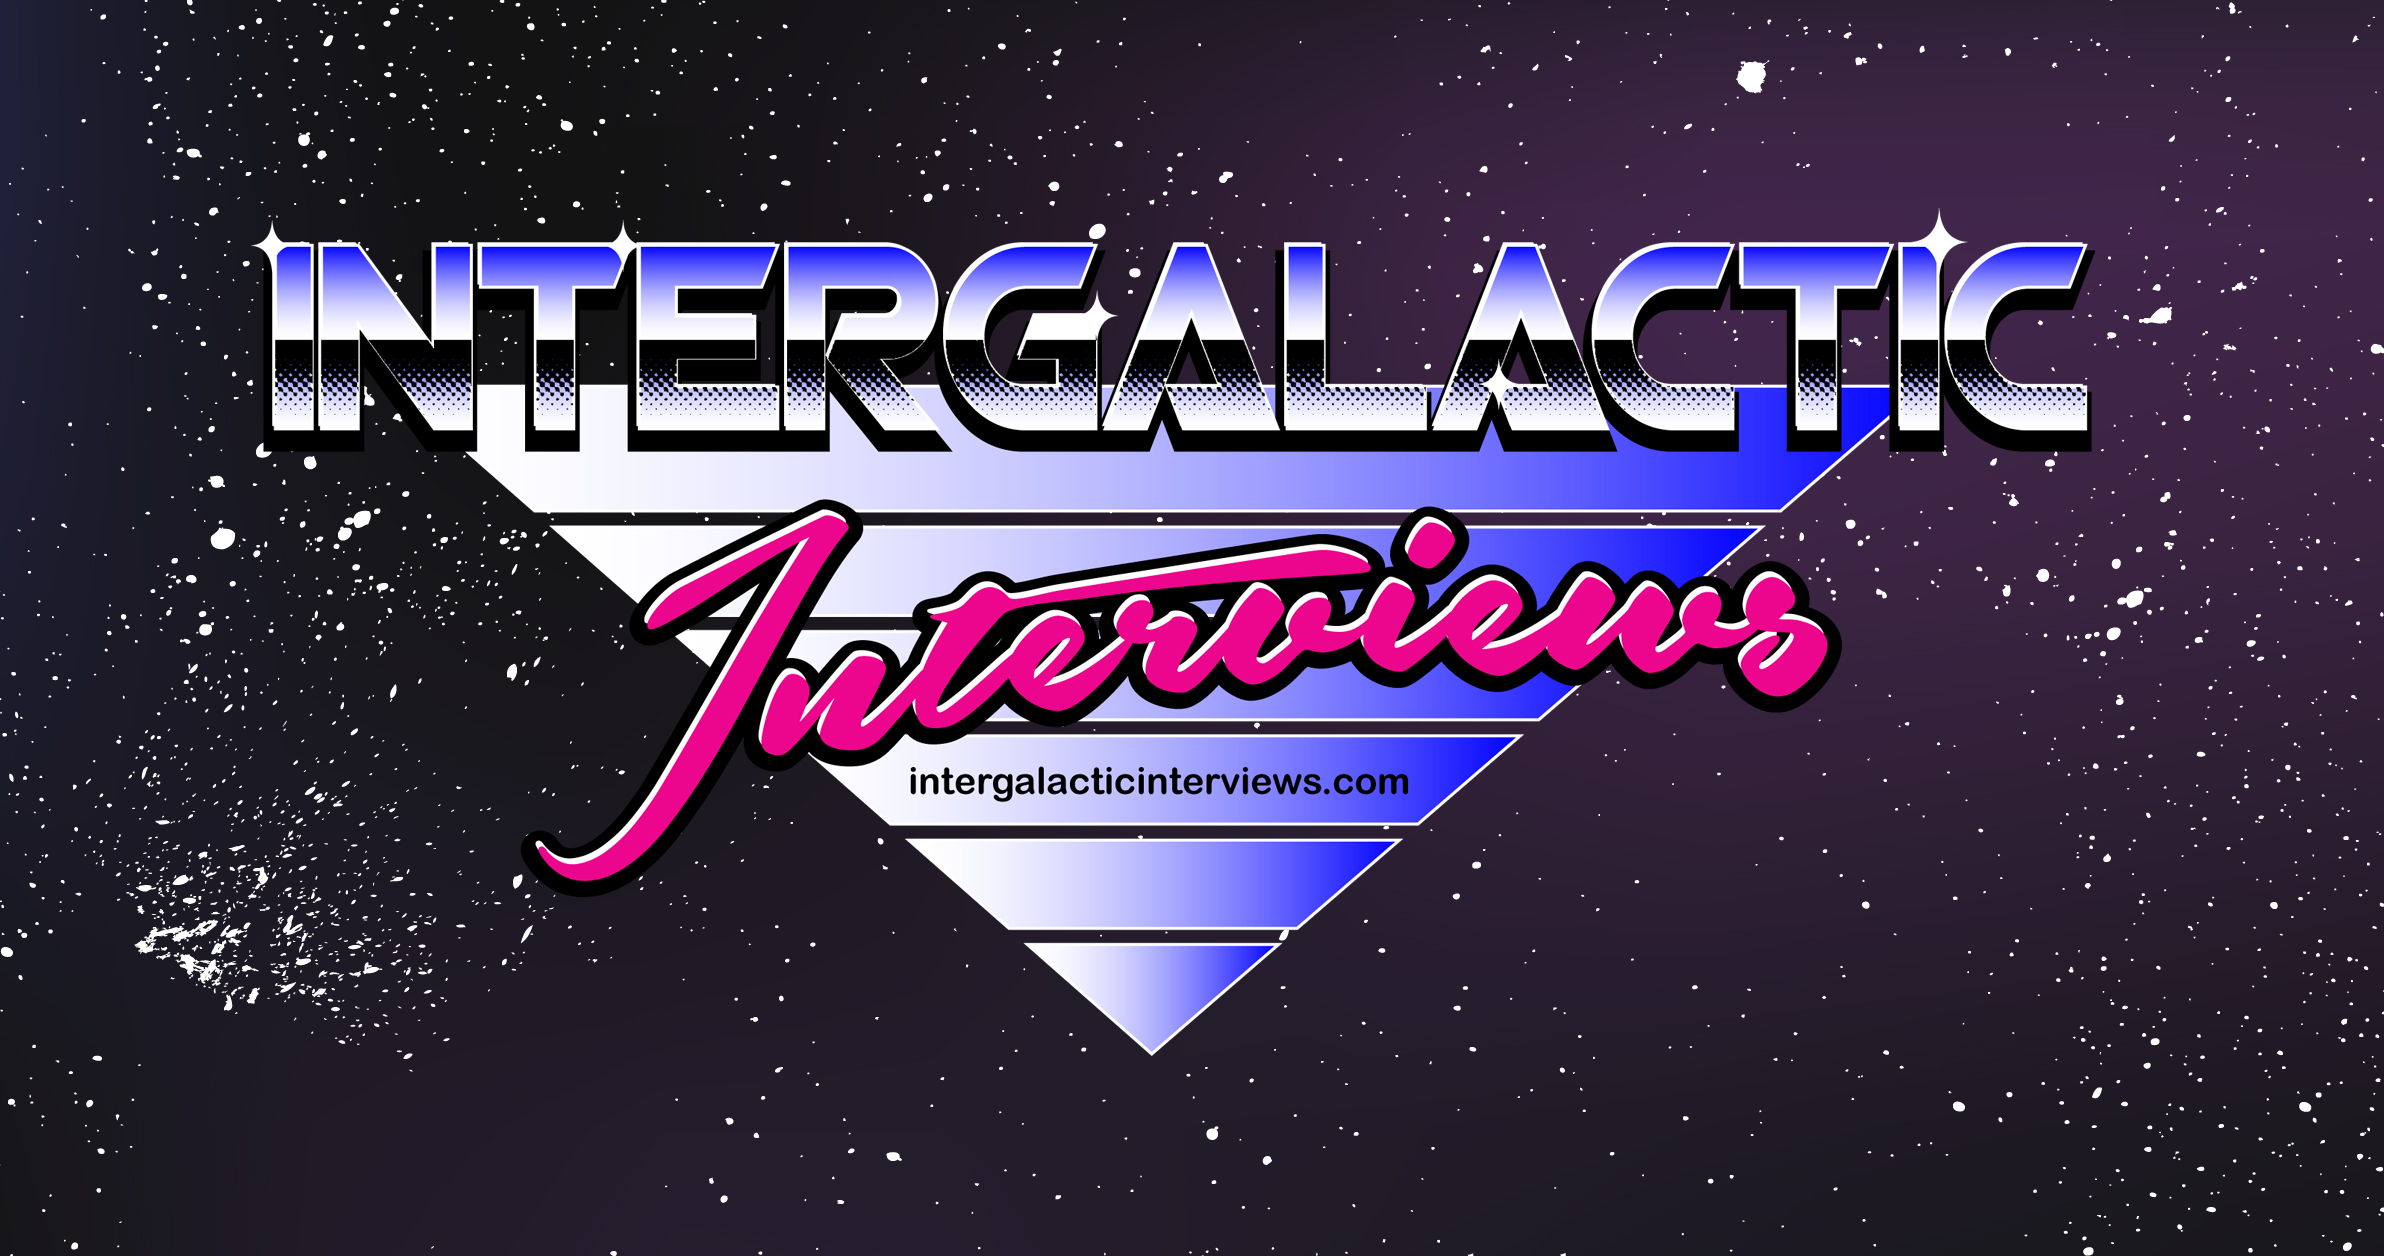 intergalactic interviews